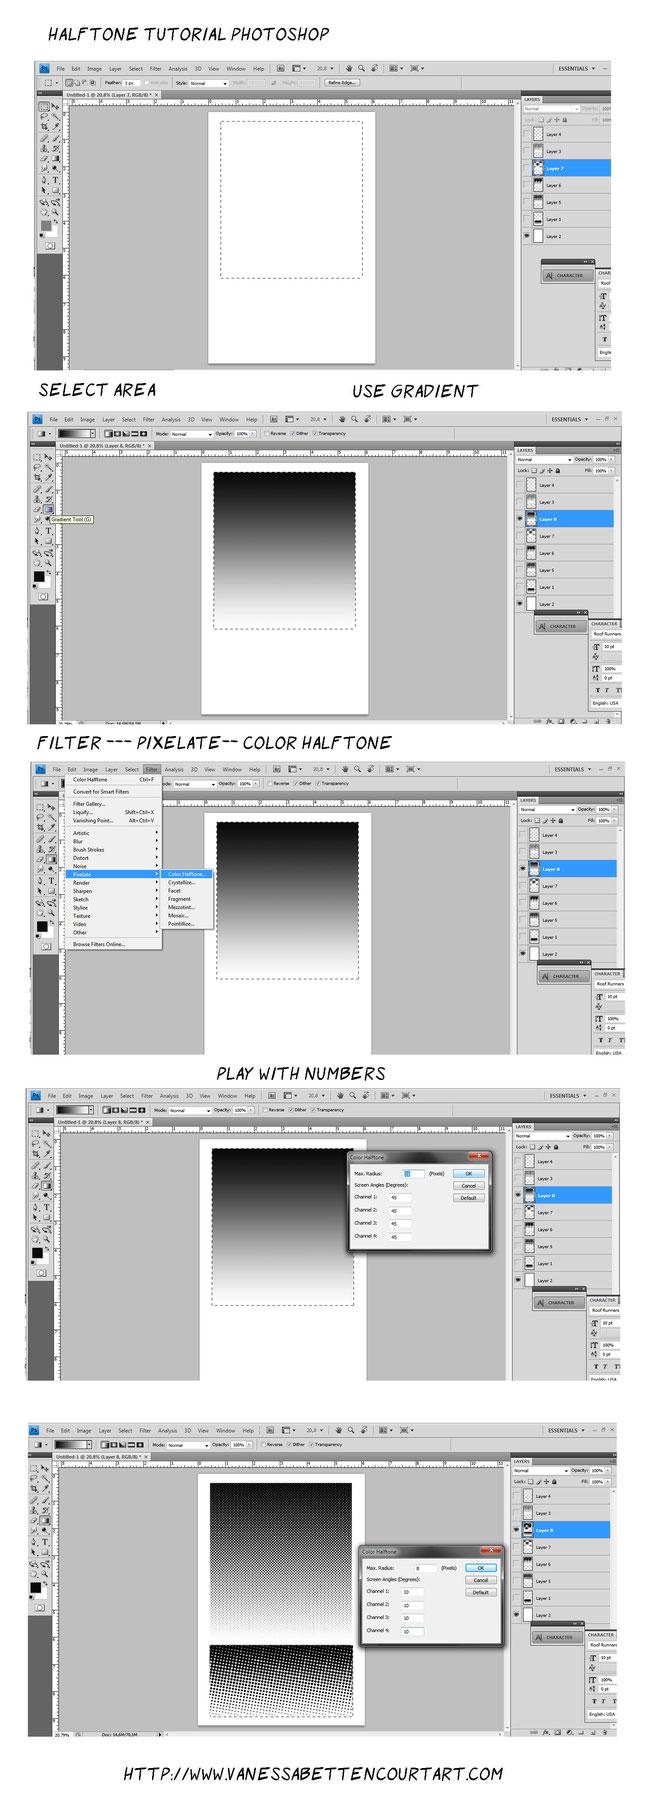 half tone color tutorial comic book halftone tutorial halftone photoshop easy tutorial gradient comic page